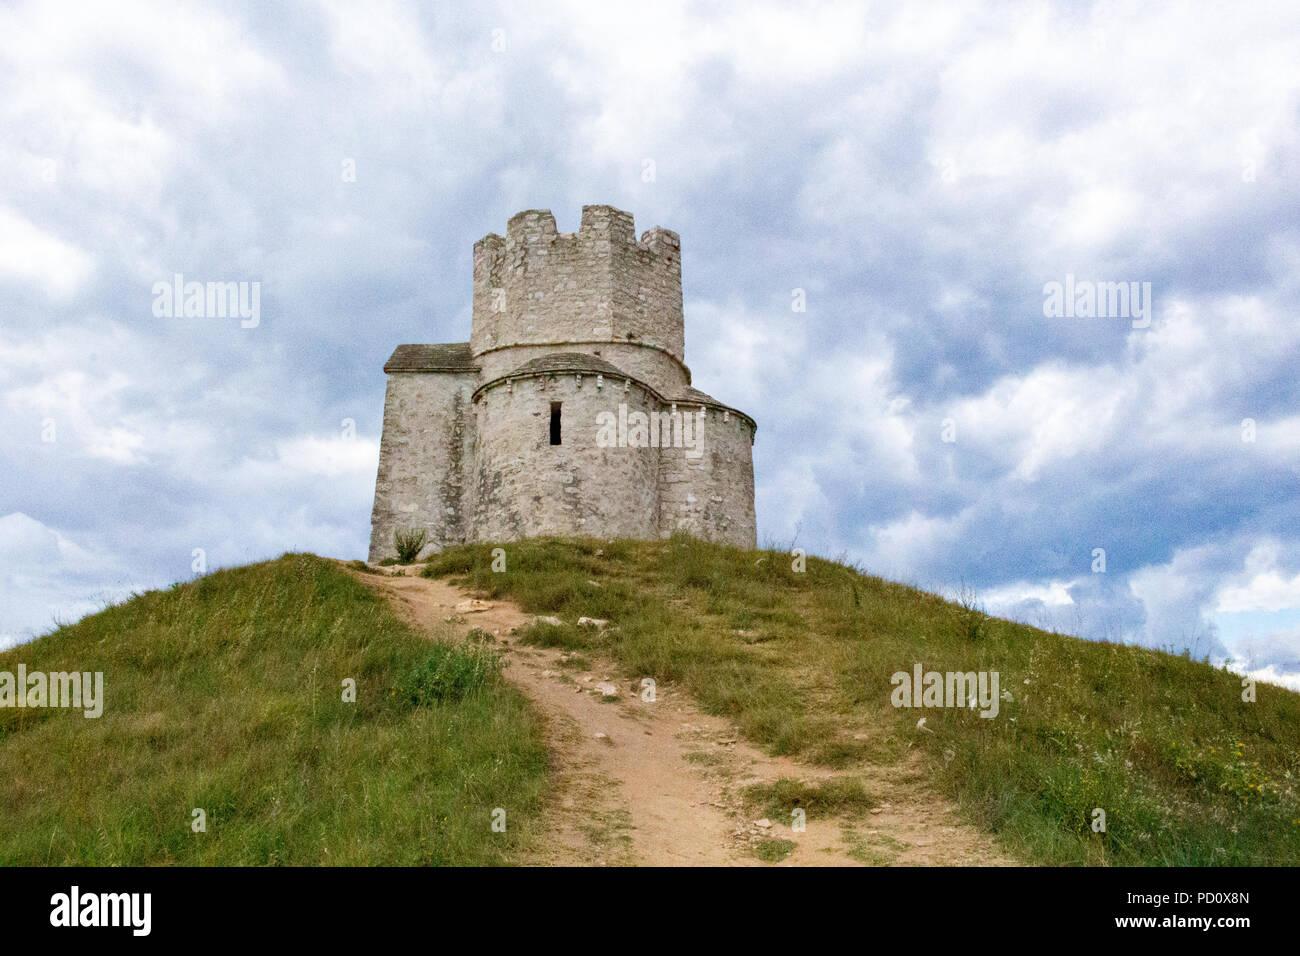 Zadar, Croatia - July 23, 2018: Saint Nicholas chapel and tower located on a hill between Nin and Zaton Stock Photo